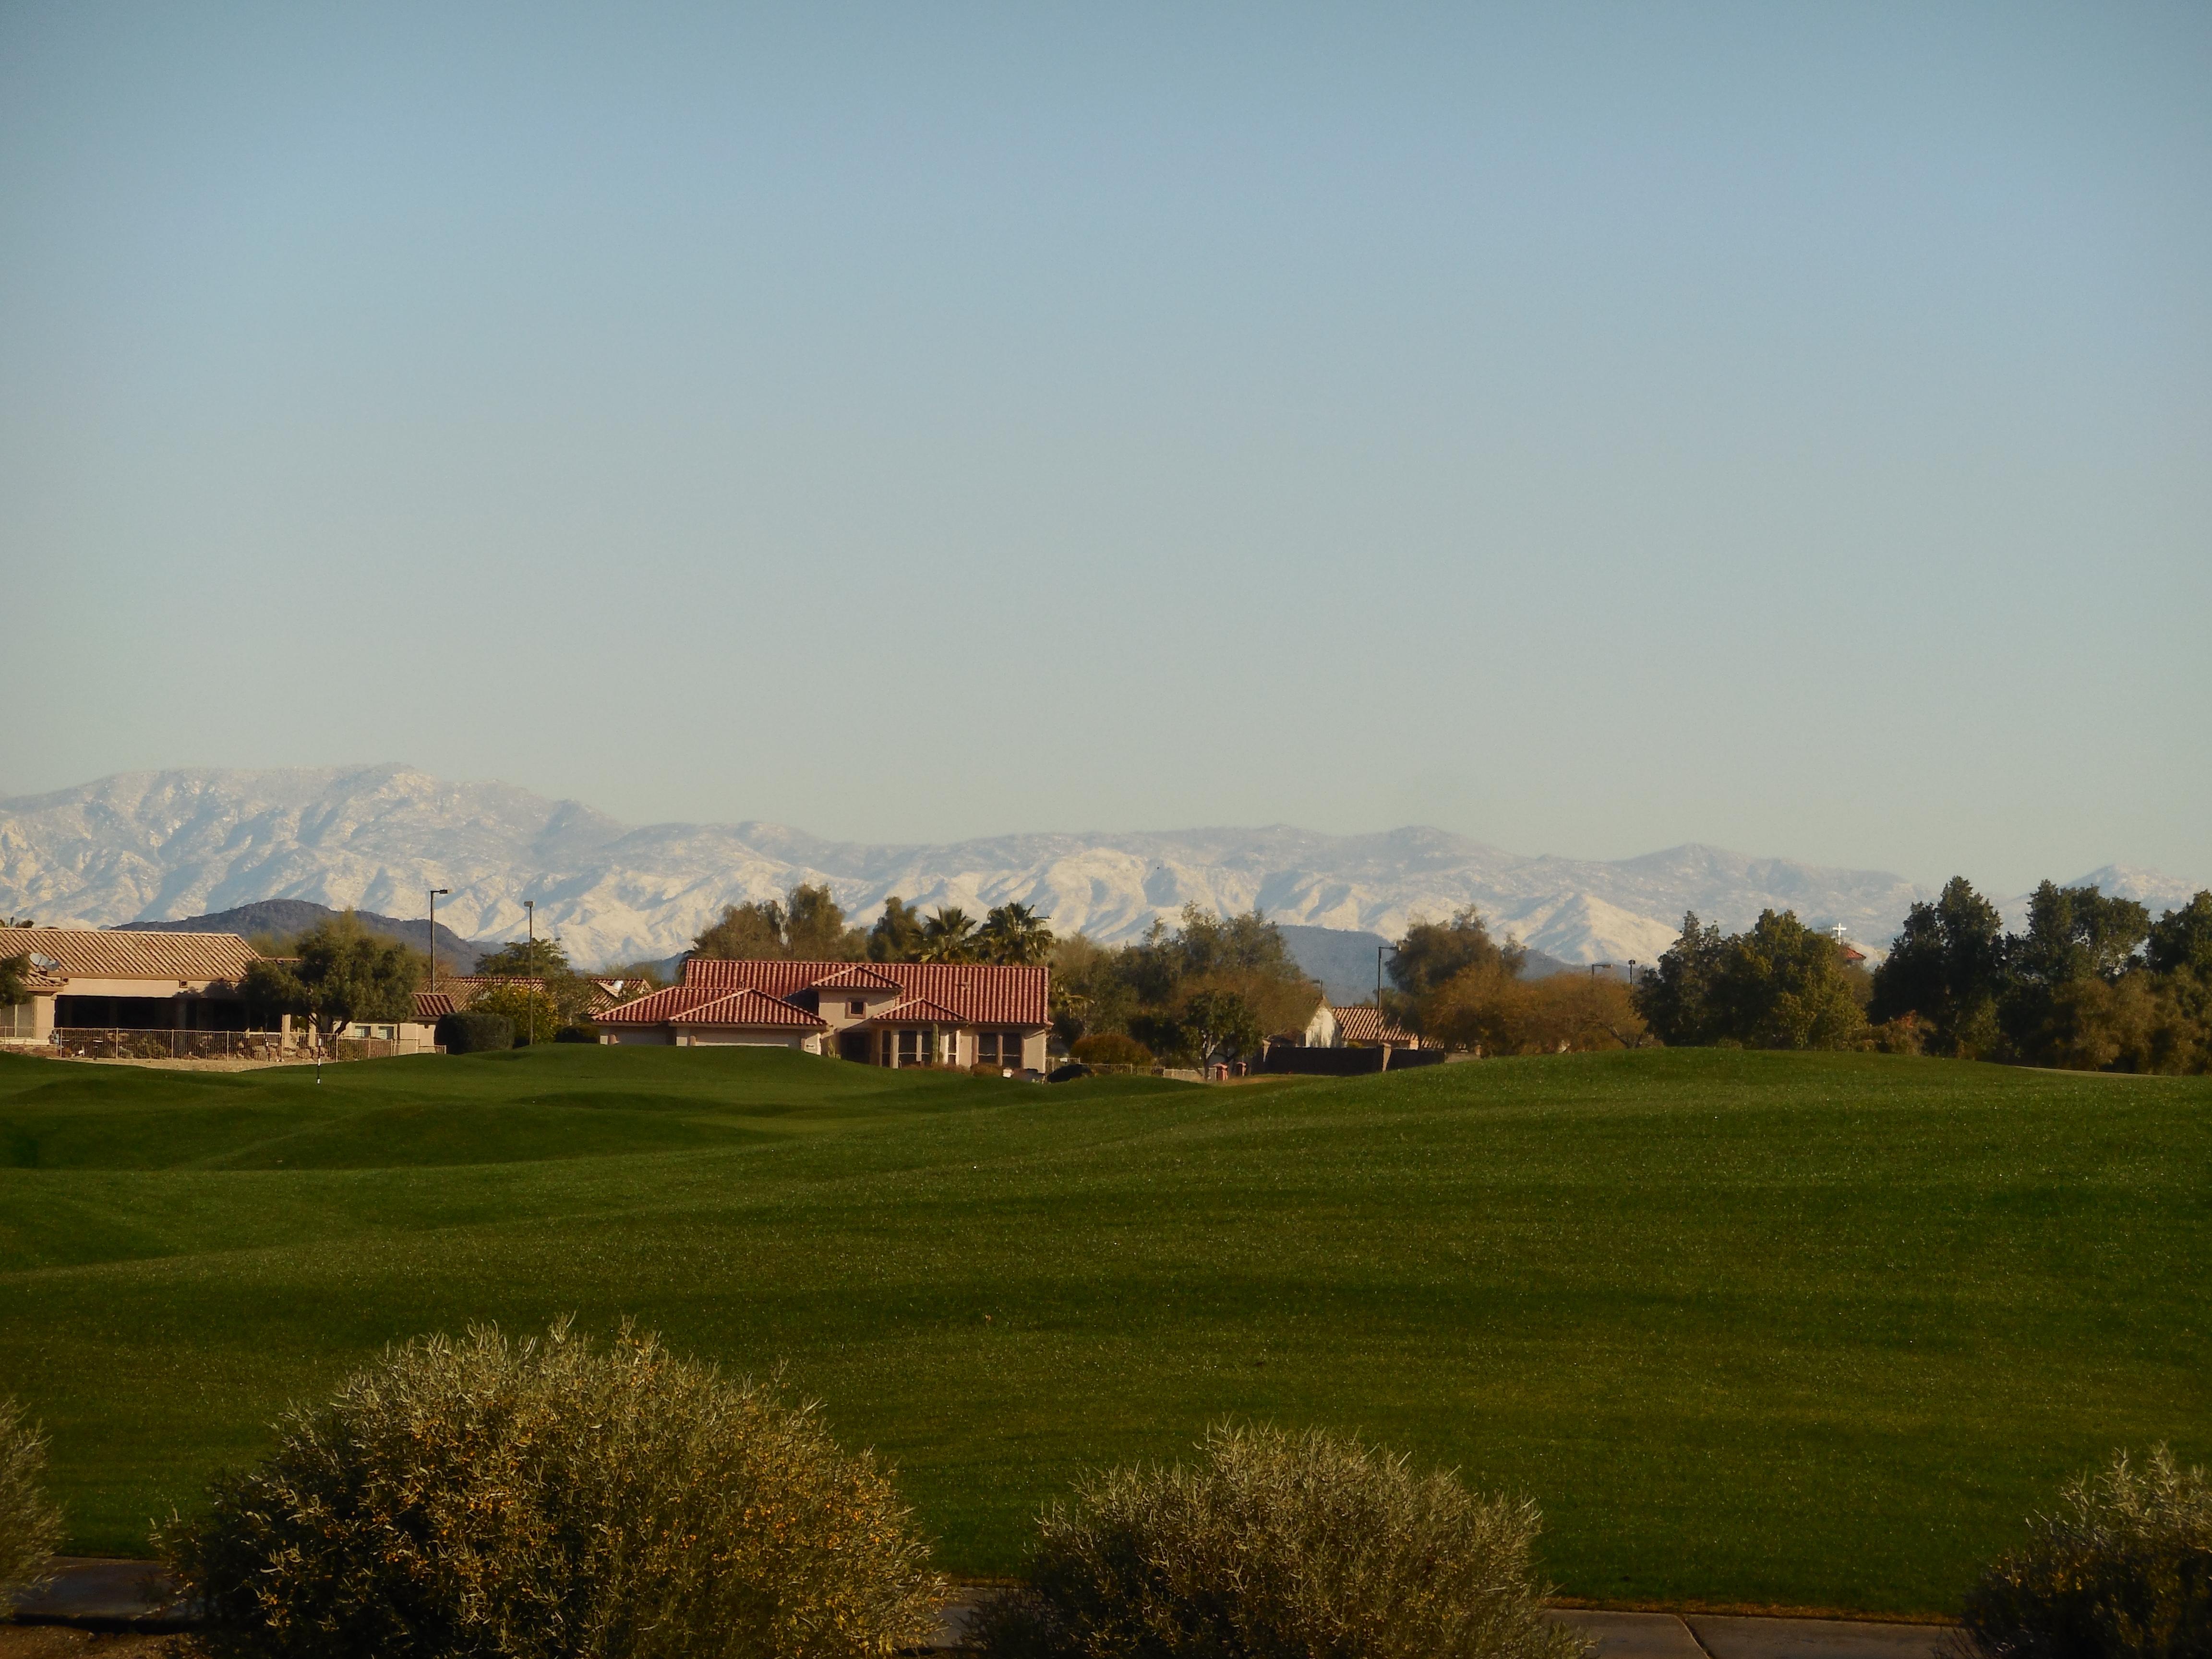 Snow in mountains N of Phoenix